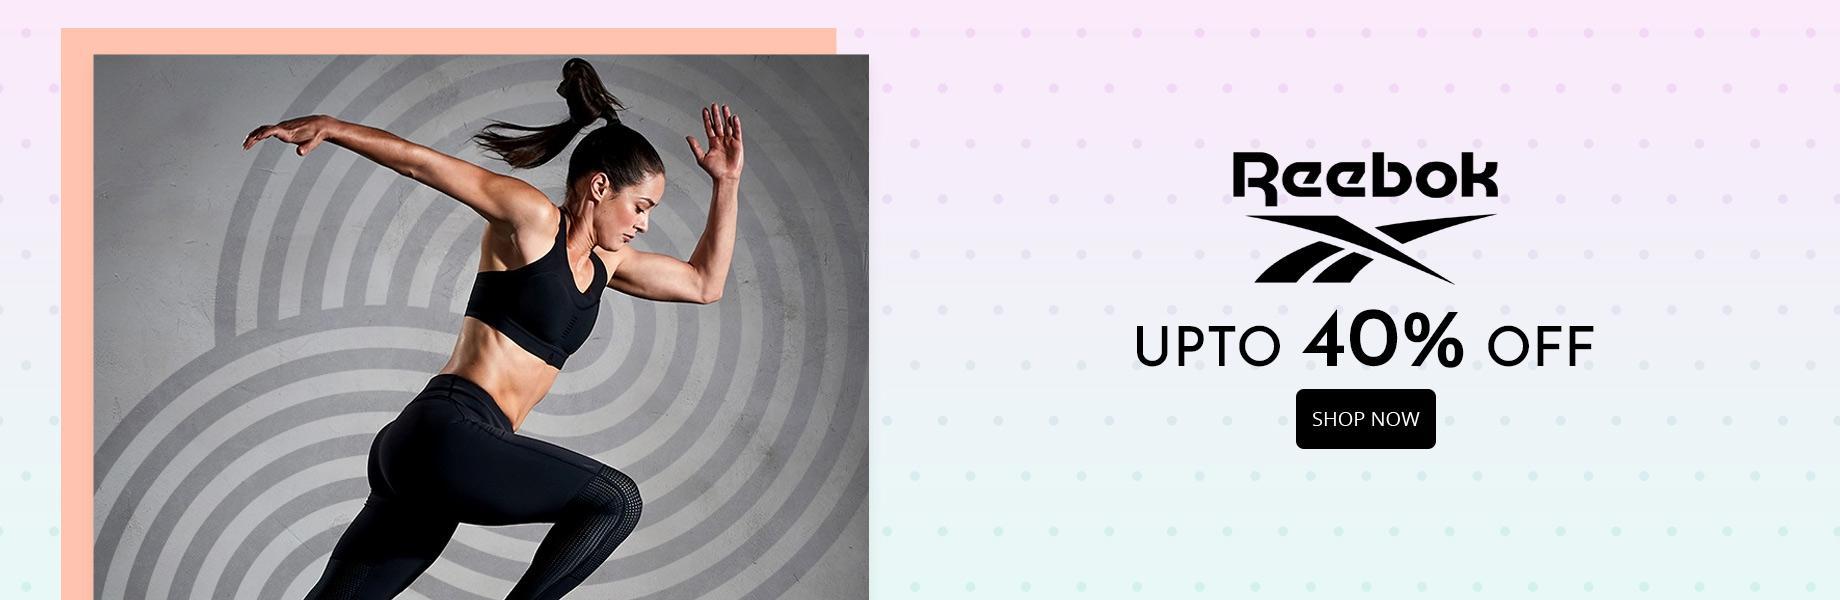 Womens-Page-Athleisure-Static-Reebok-Web.jpg